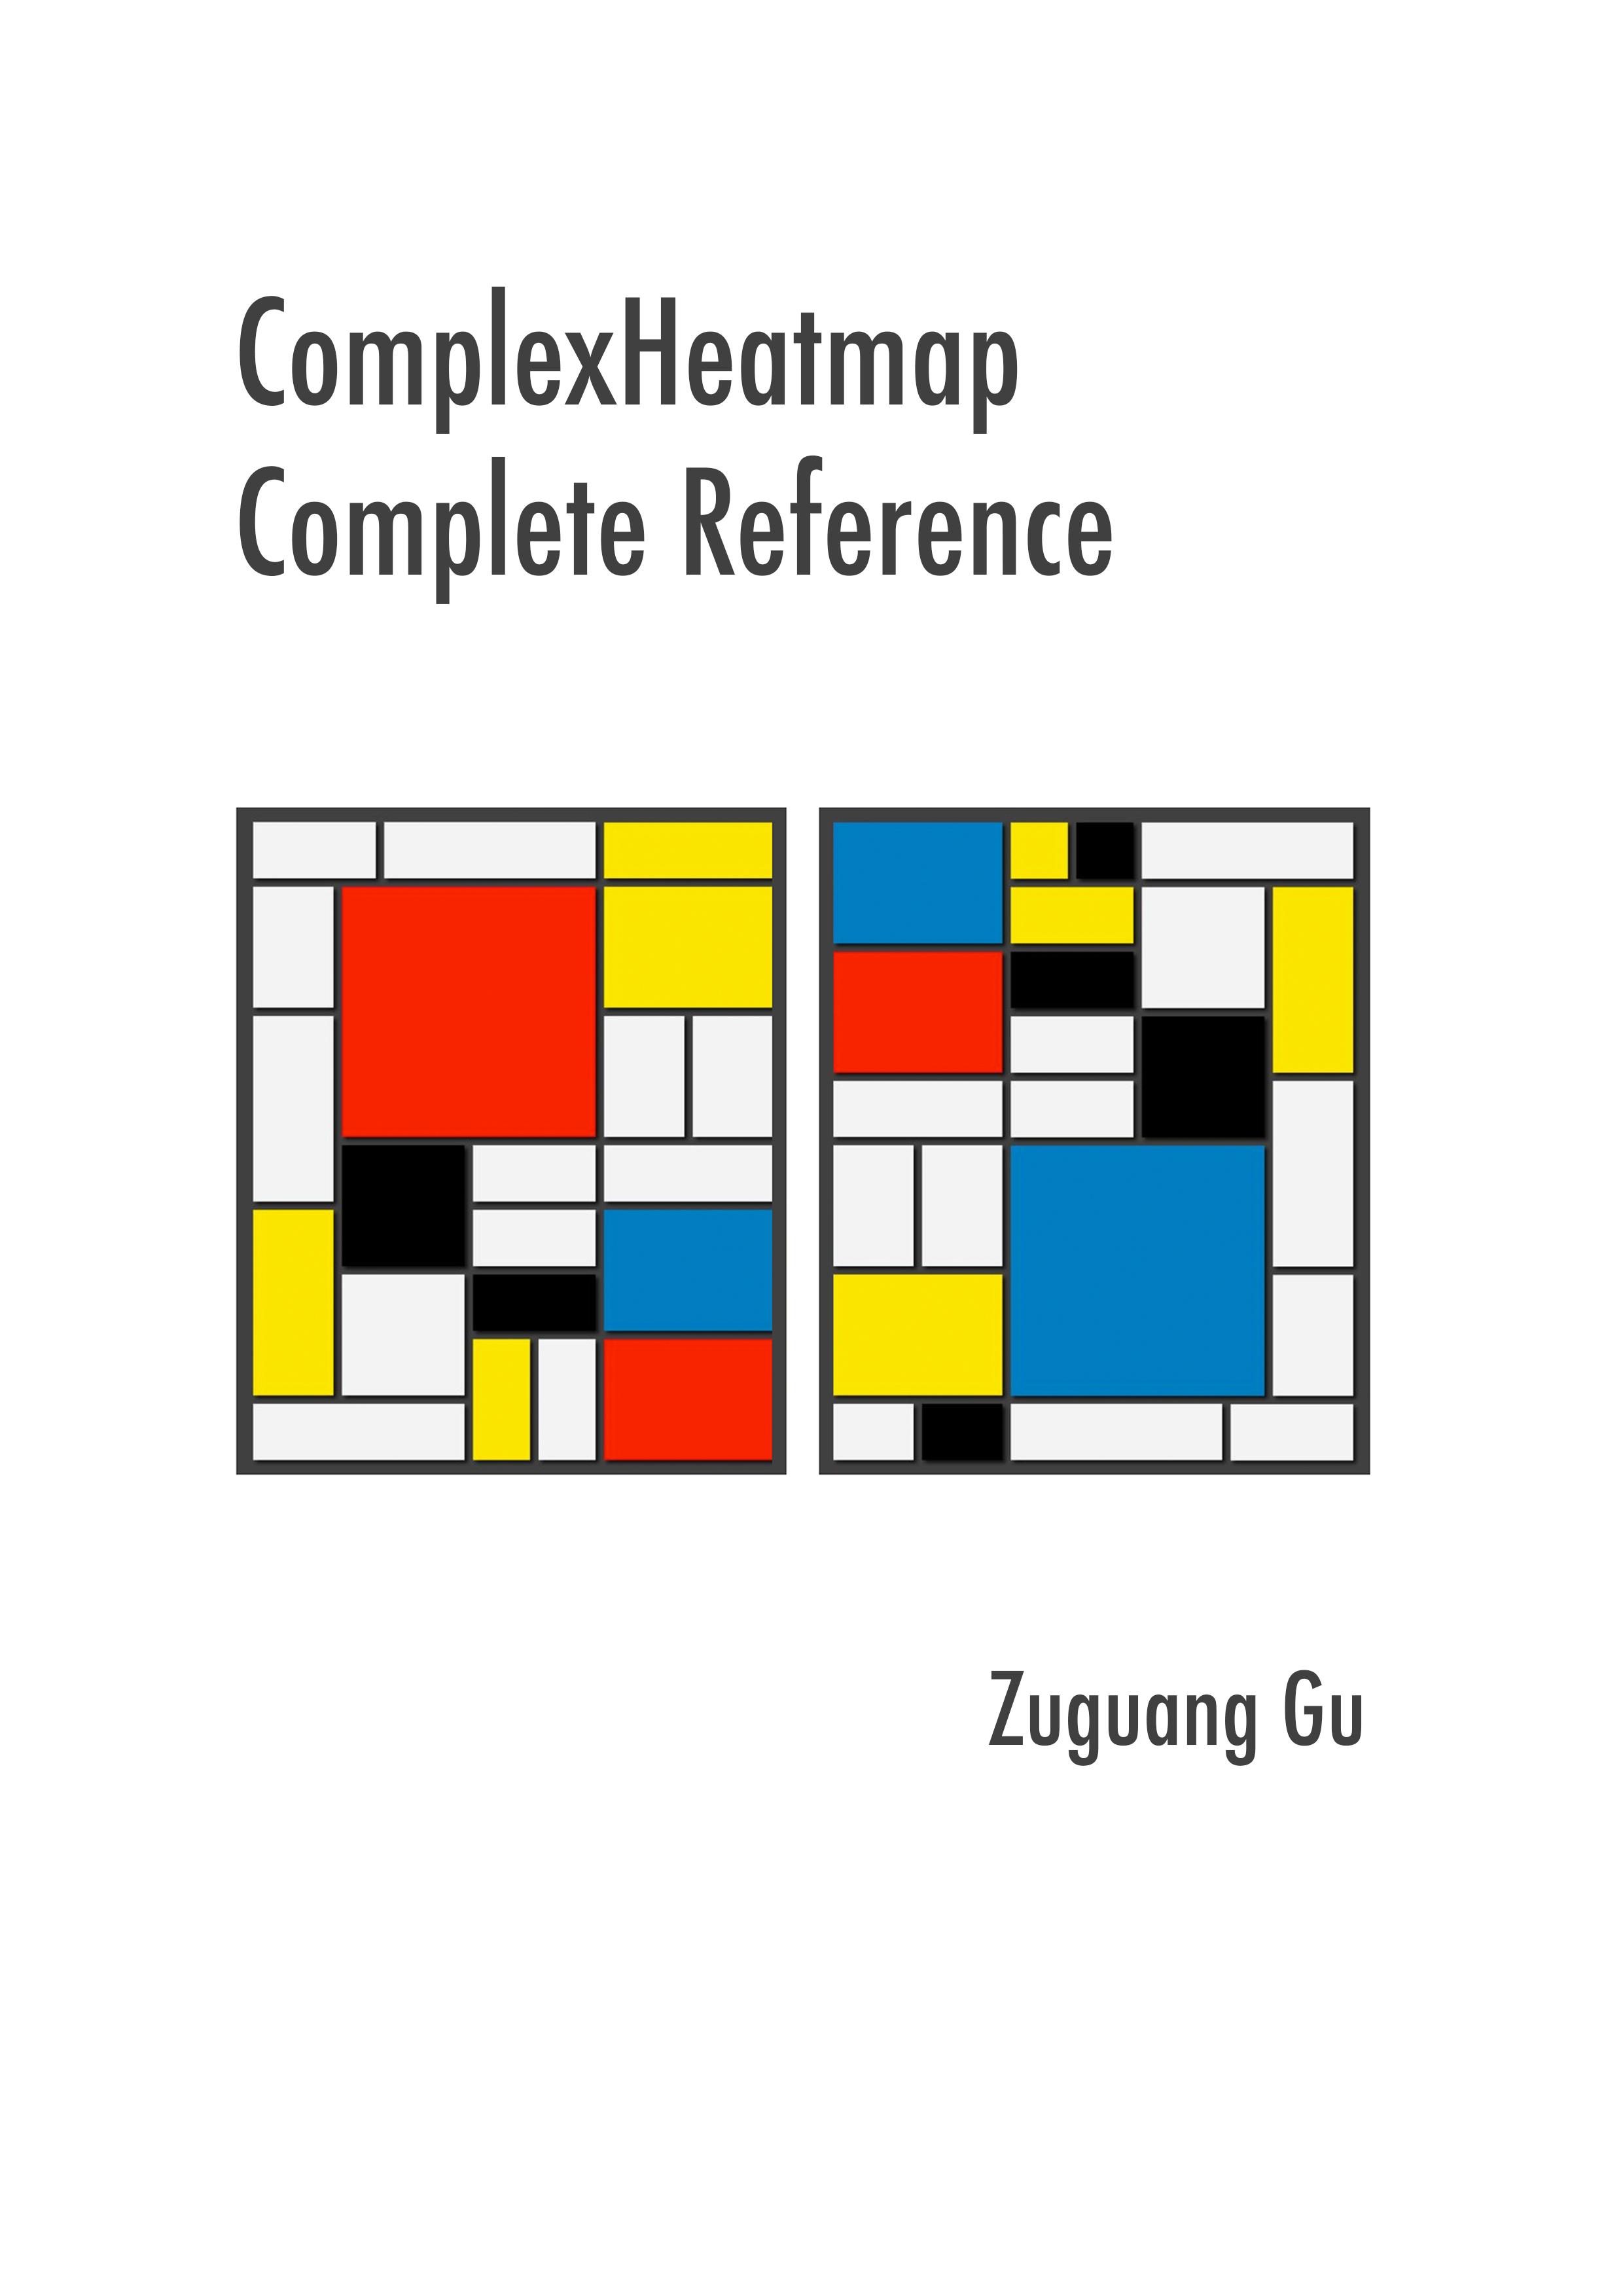 GitHub - jokergoo/ComplexHeatmap: Make Complex Heatmaps